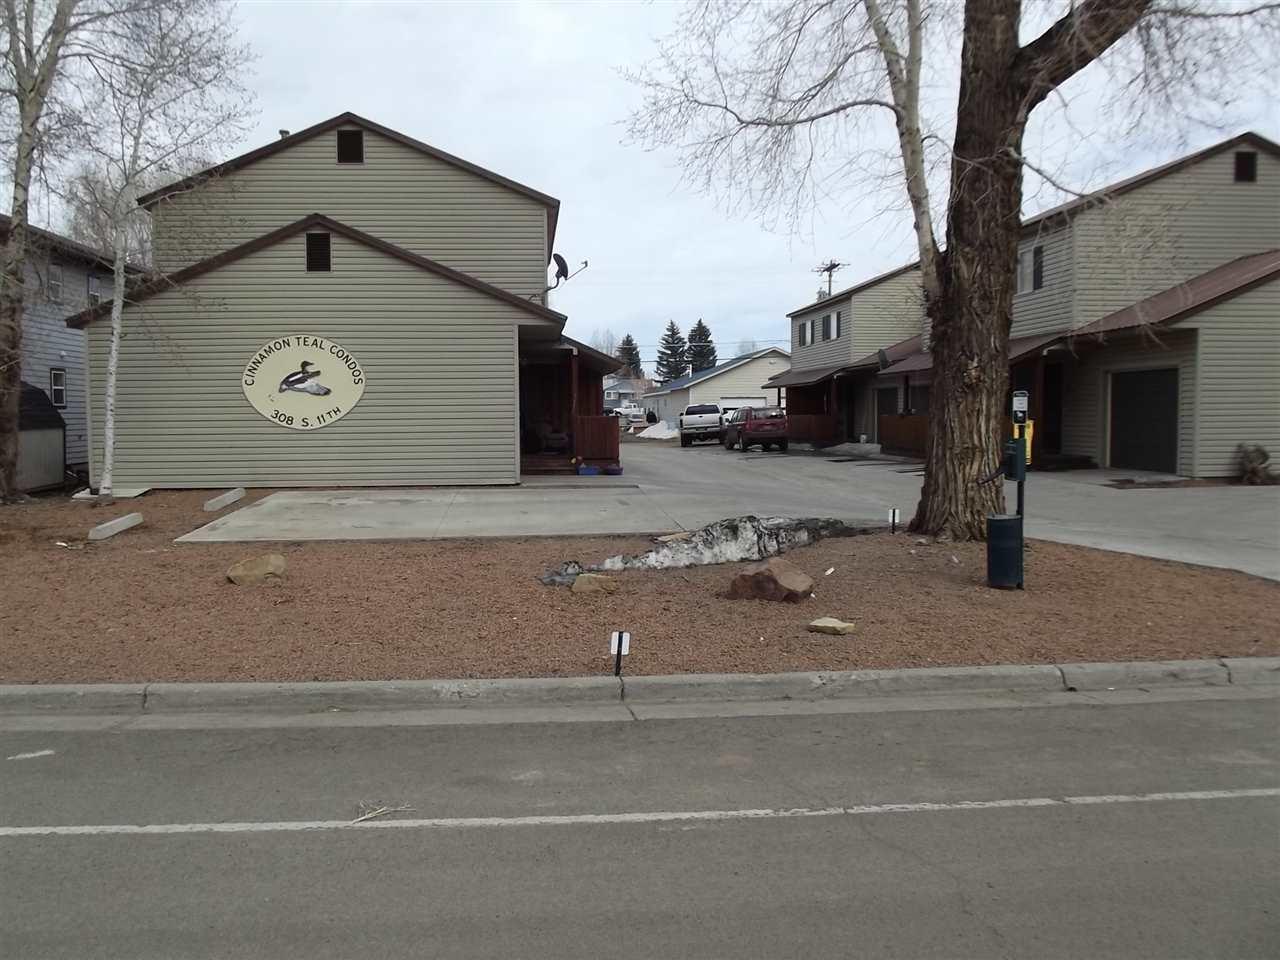 308 S 11th St # 8, Gunnison, CO 81230